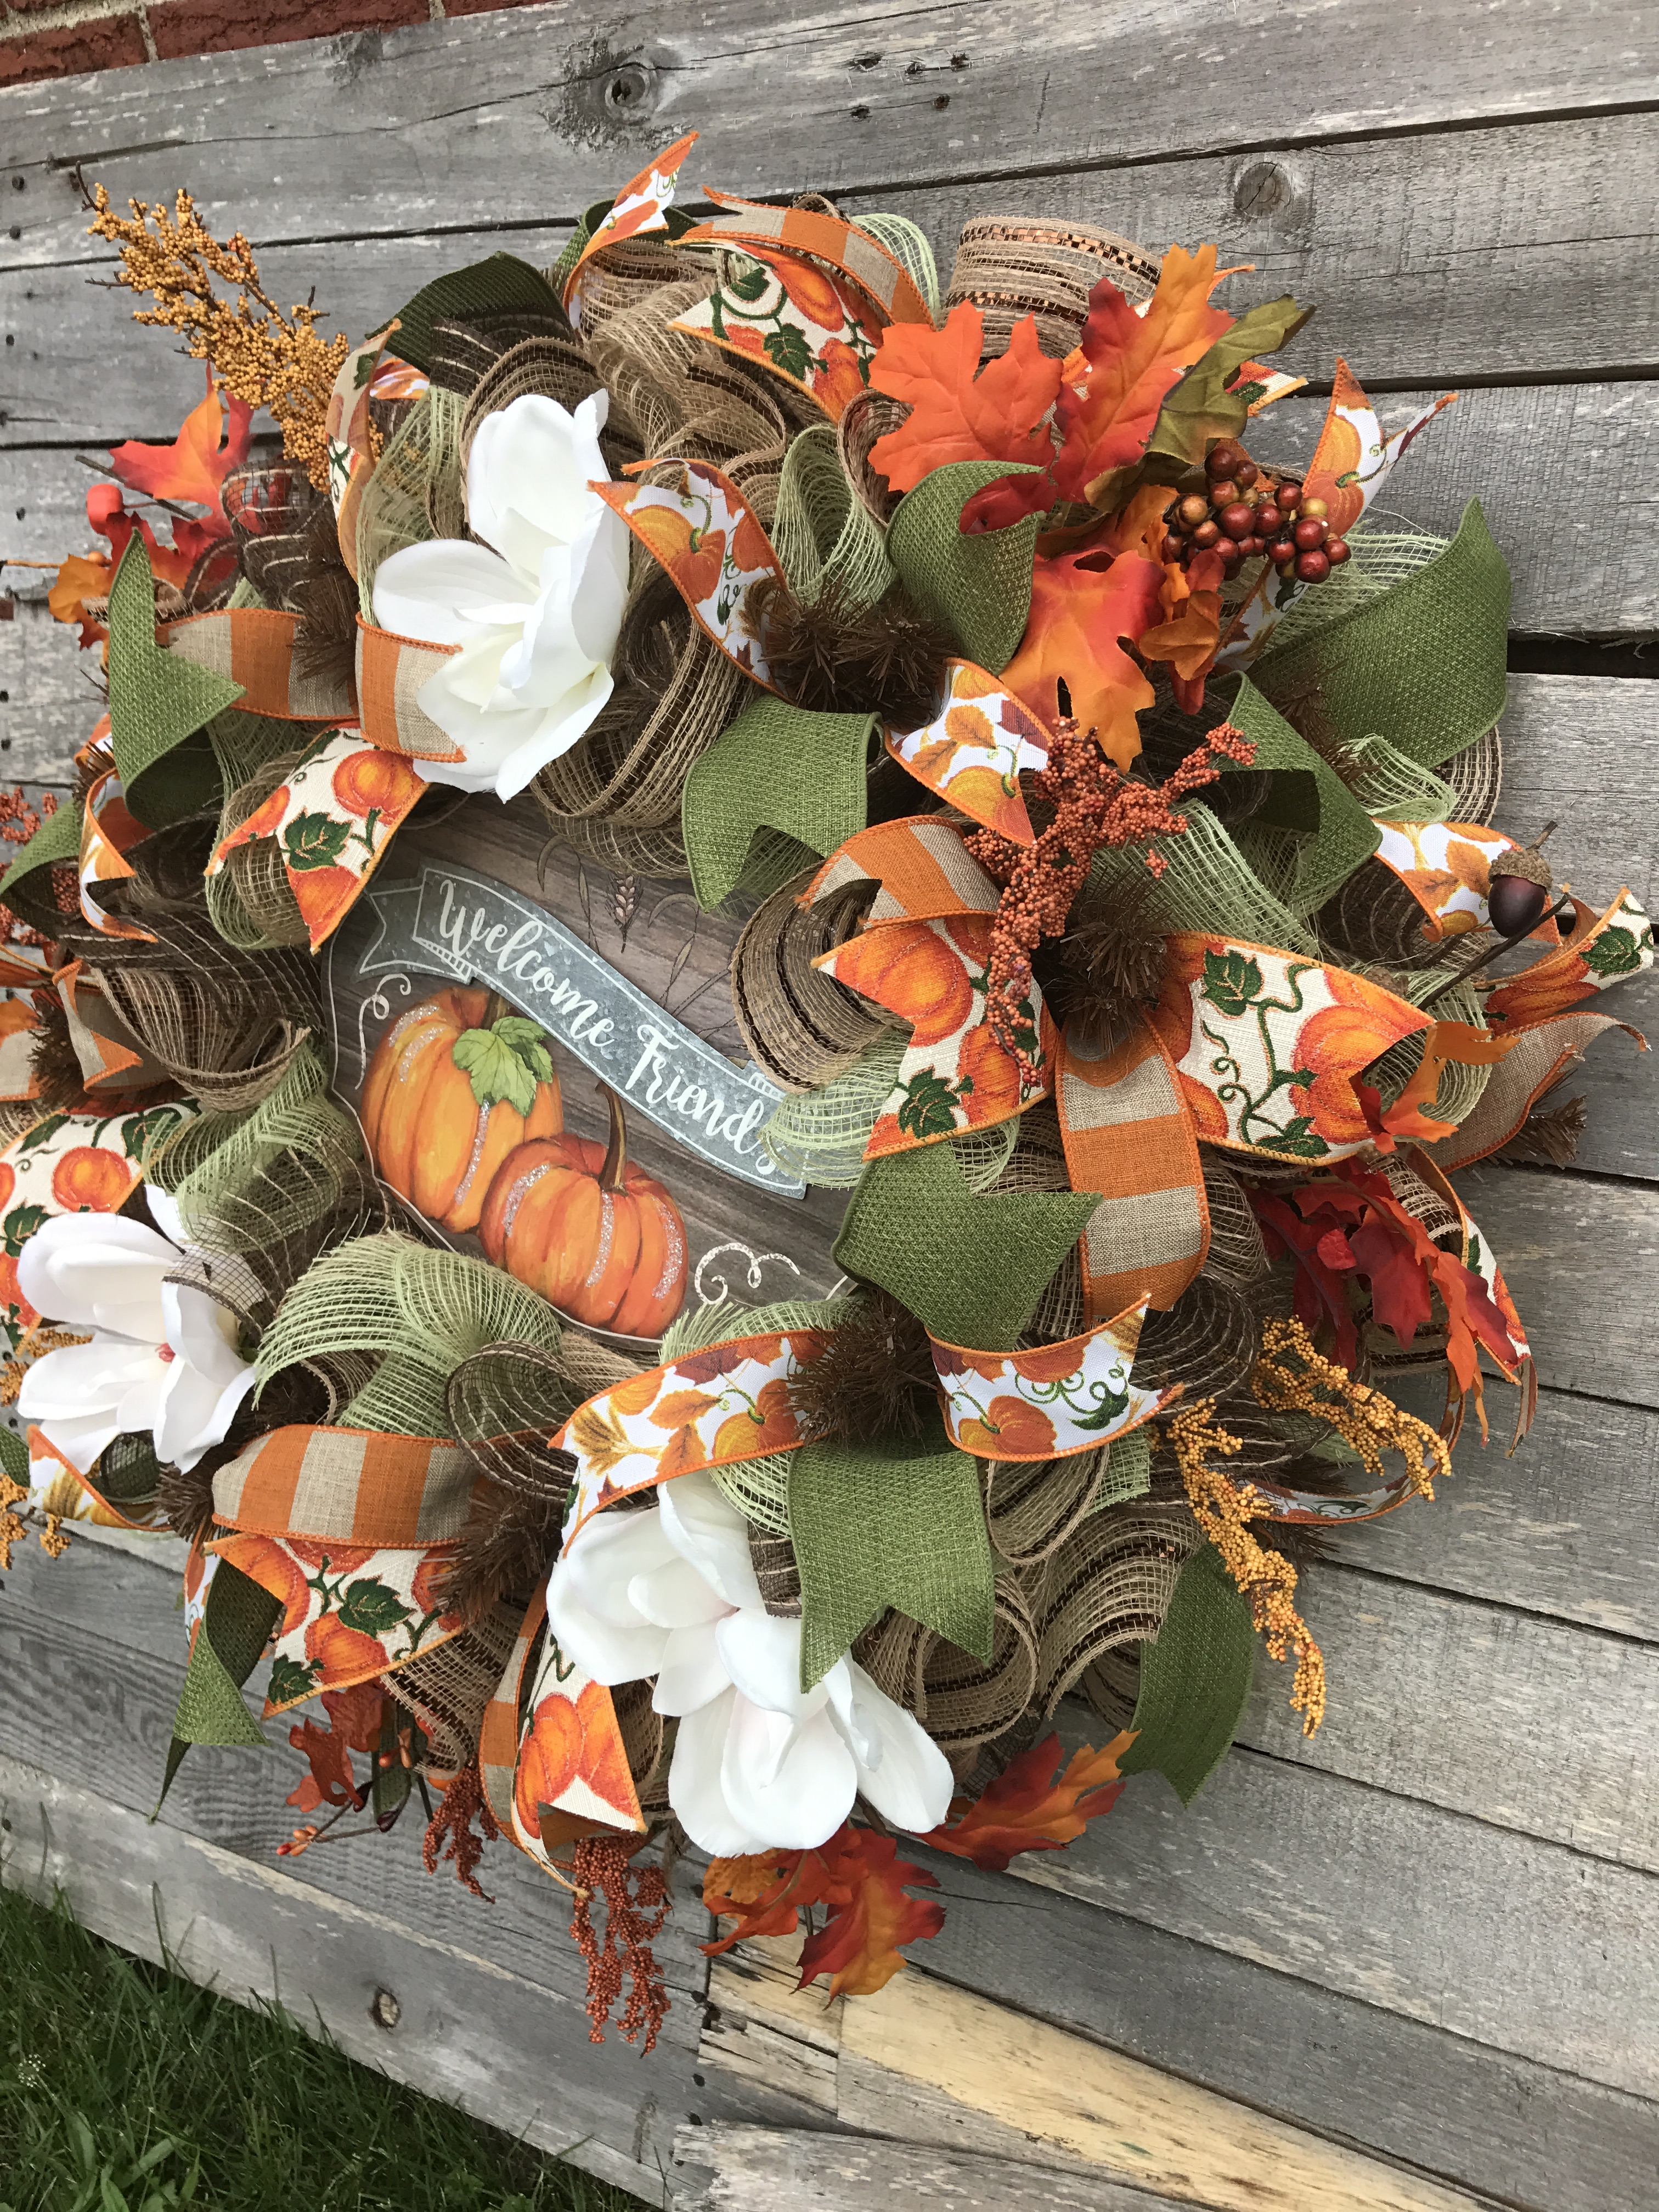 Fall wreath fall door wreath large fall wreath for front door 20170810150829653ios 20170810150829653ios 20170810150538516ios 20170810150520433ios 20170810150517063ios 20170810145802273ios rubansaba